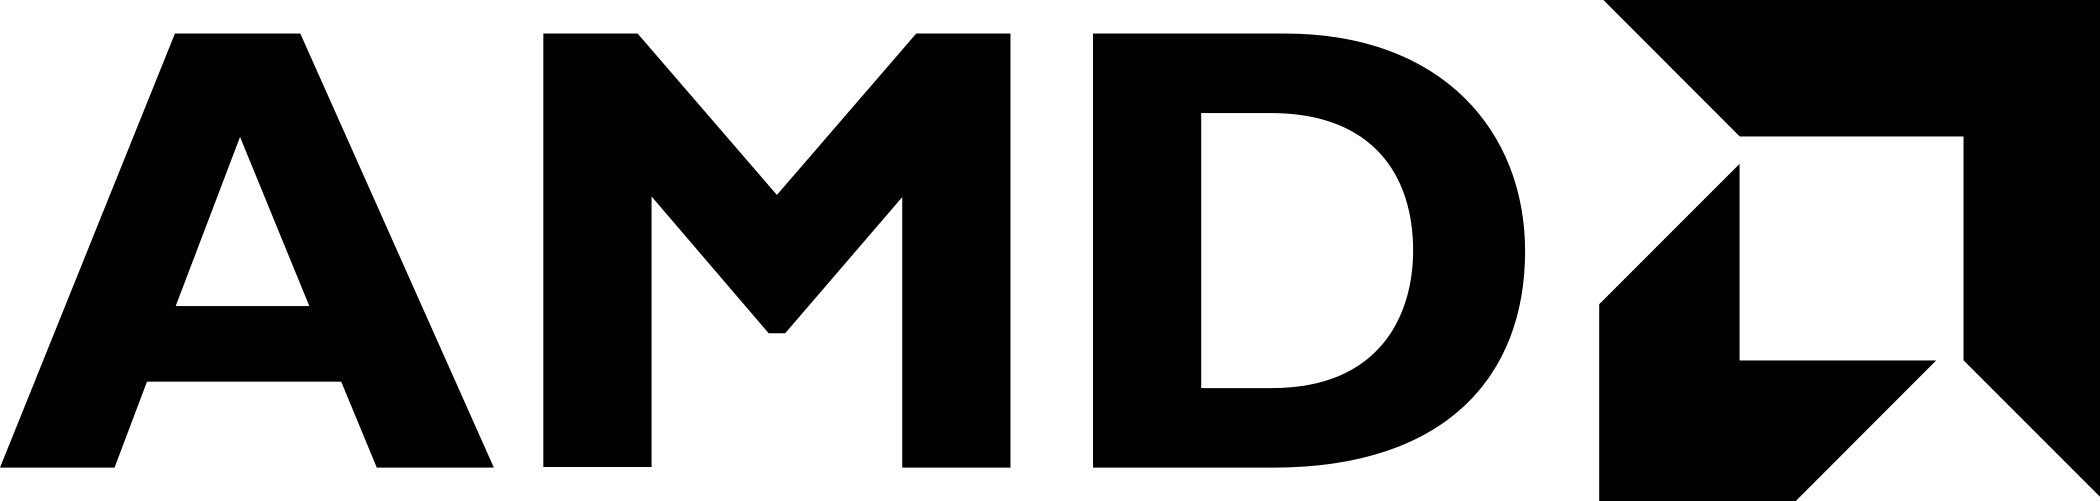 amd logo 1 1 - AMD Logo